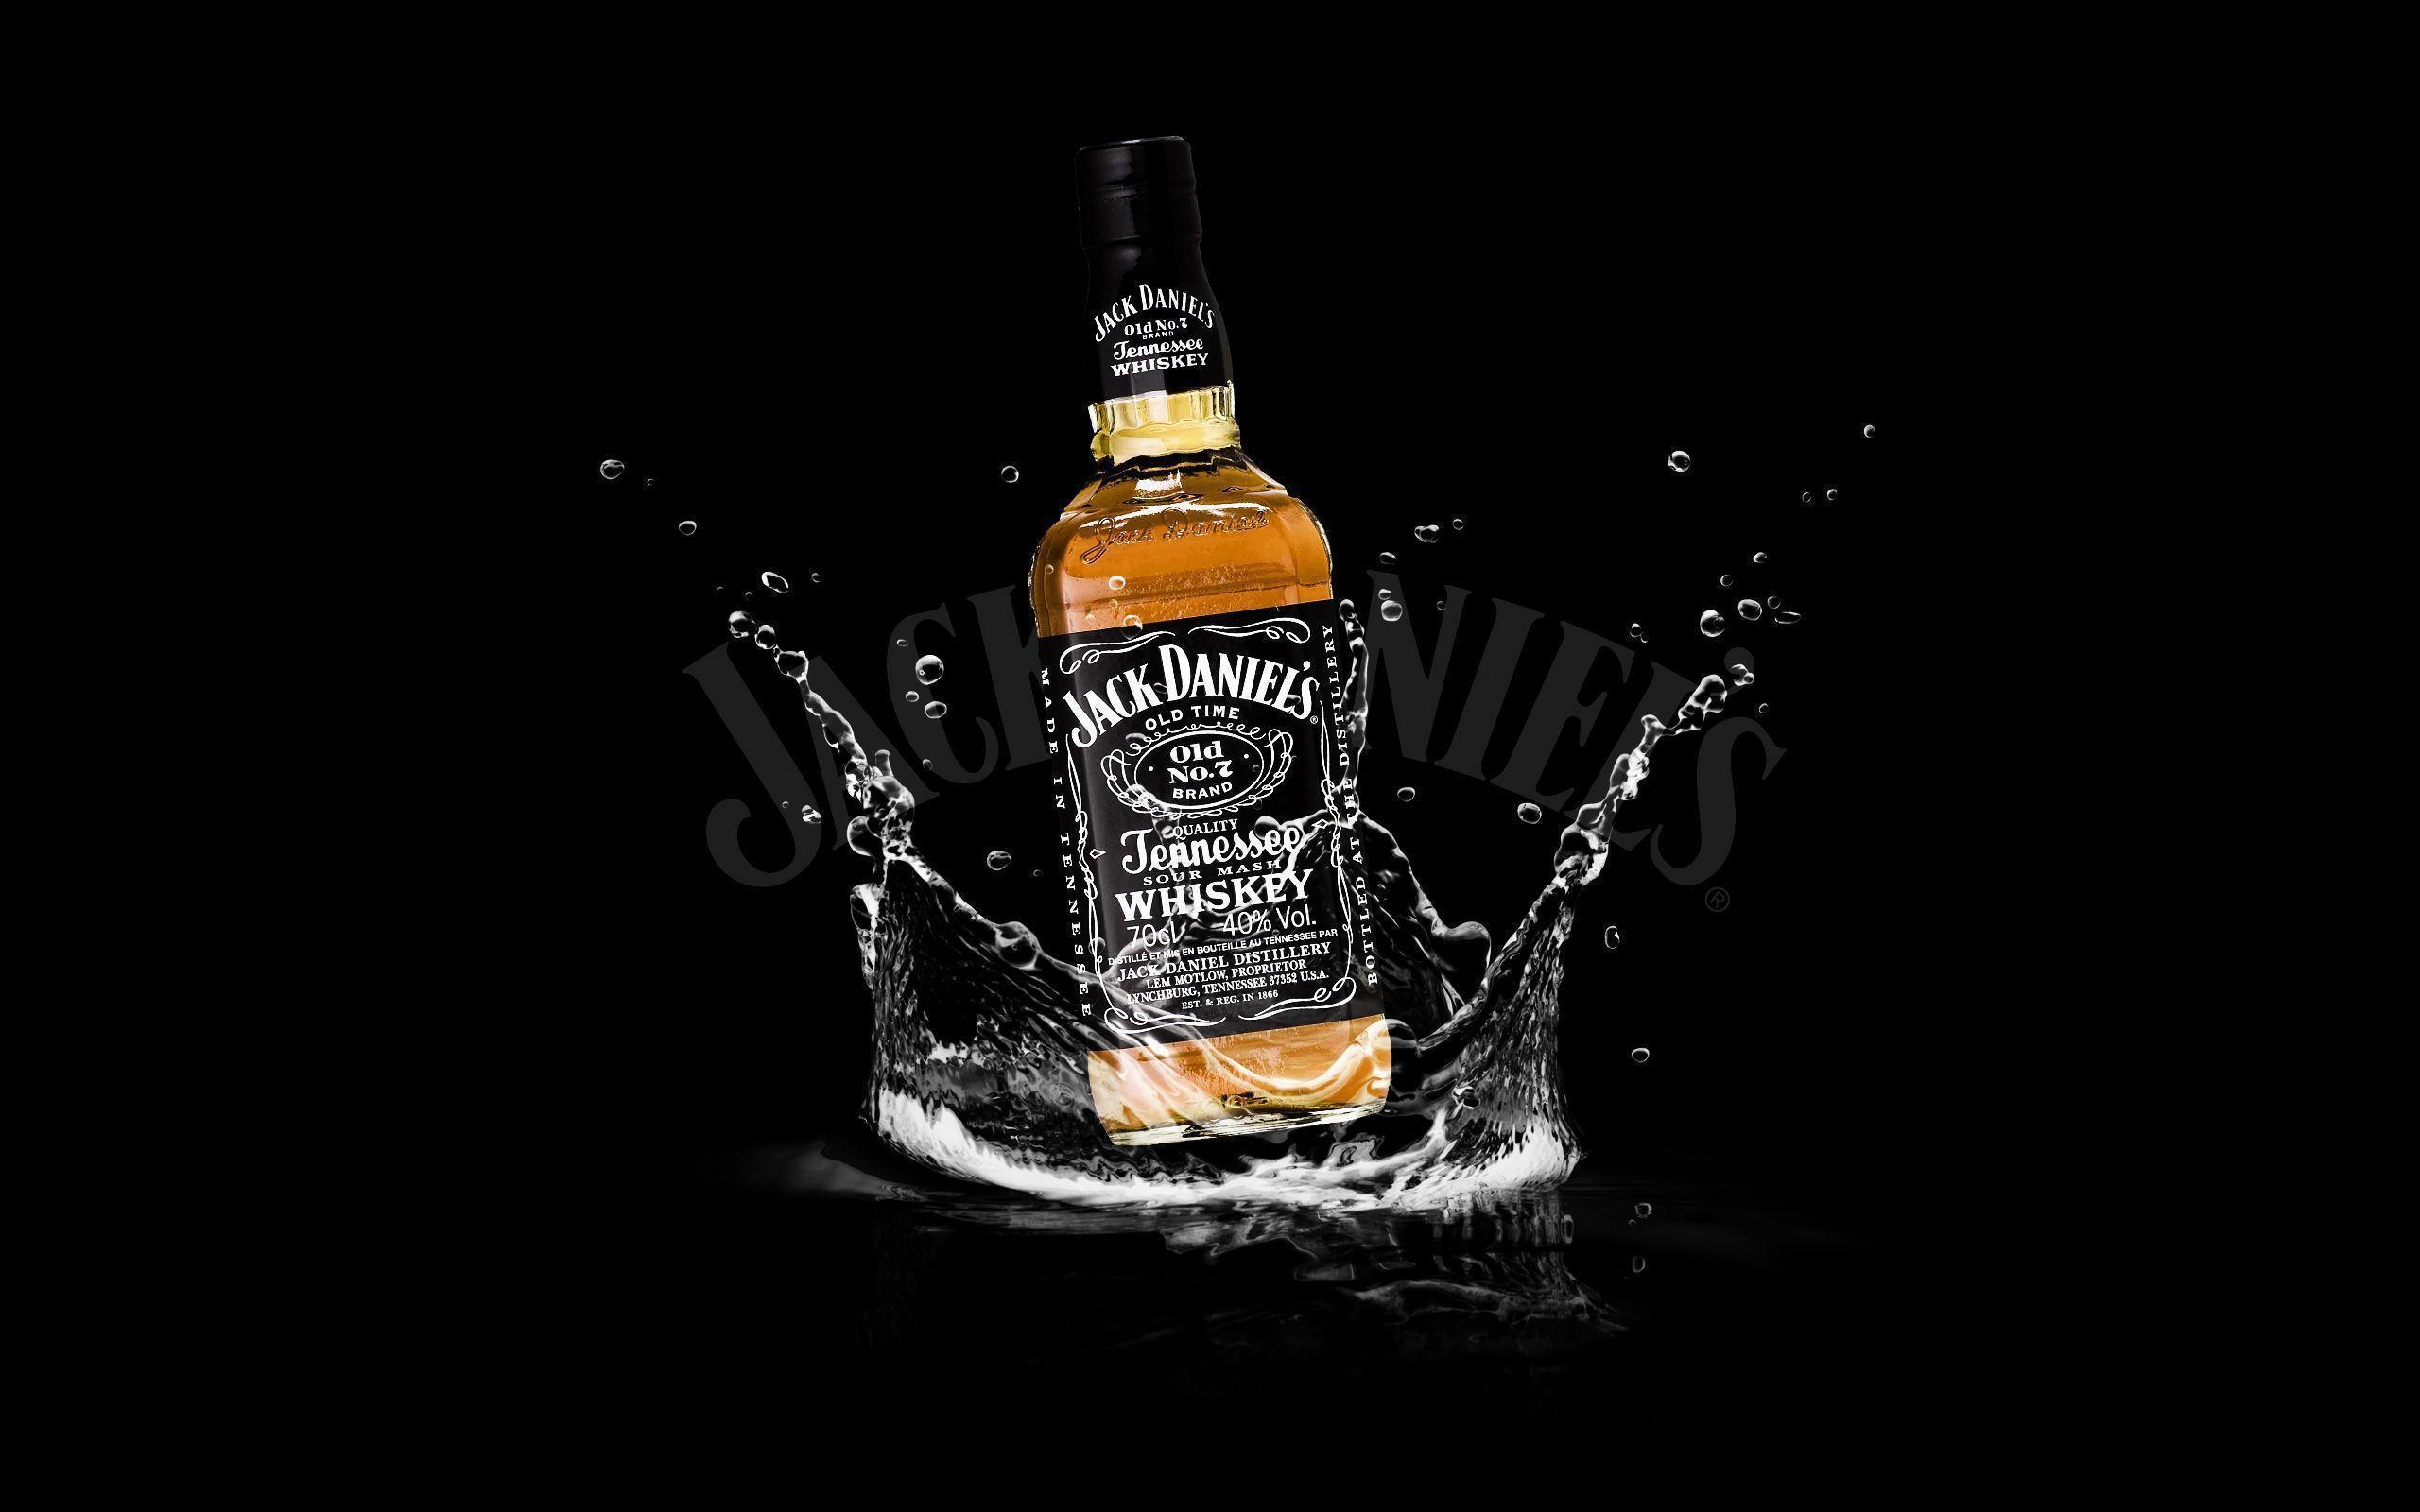 Jack Daniels Wallpapers 2560x1600